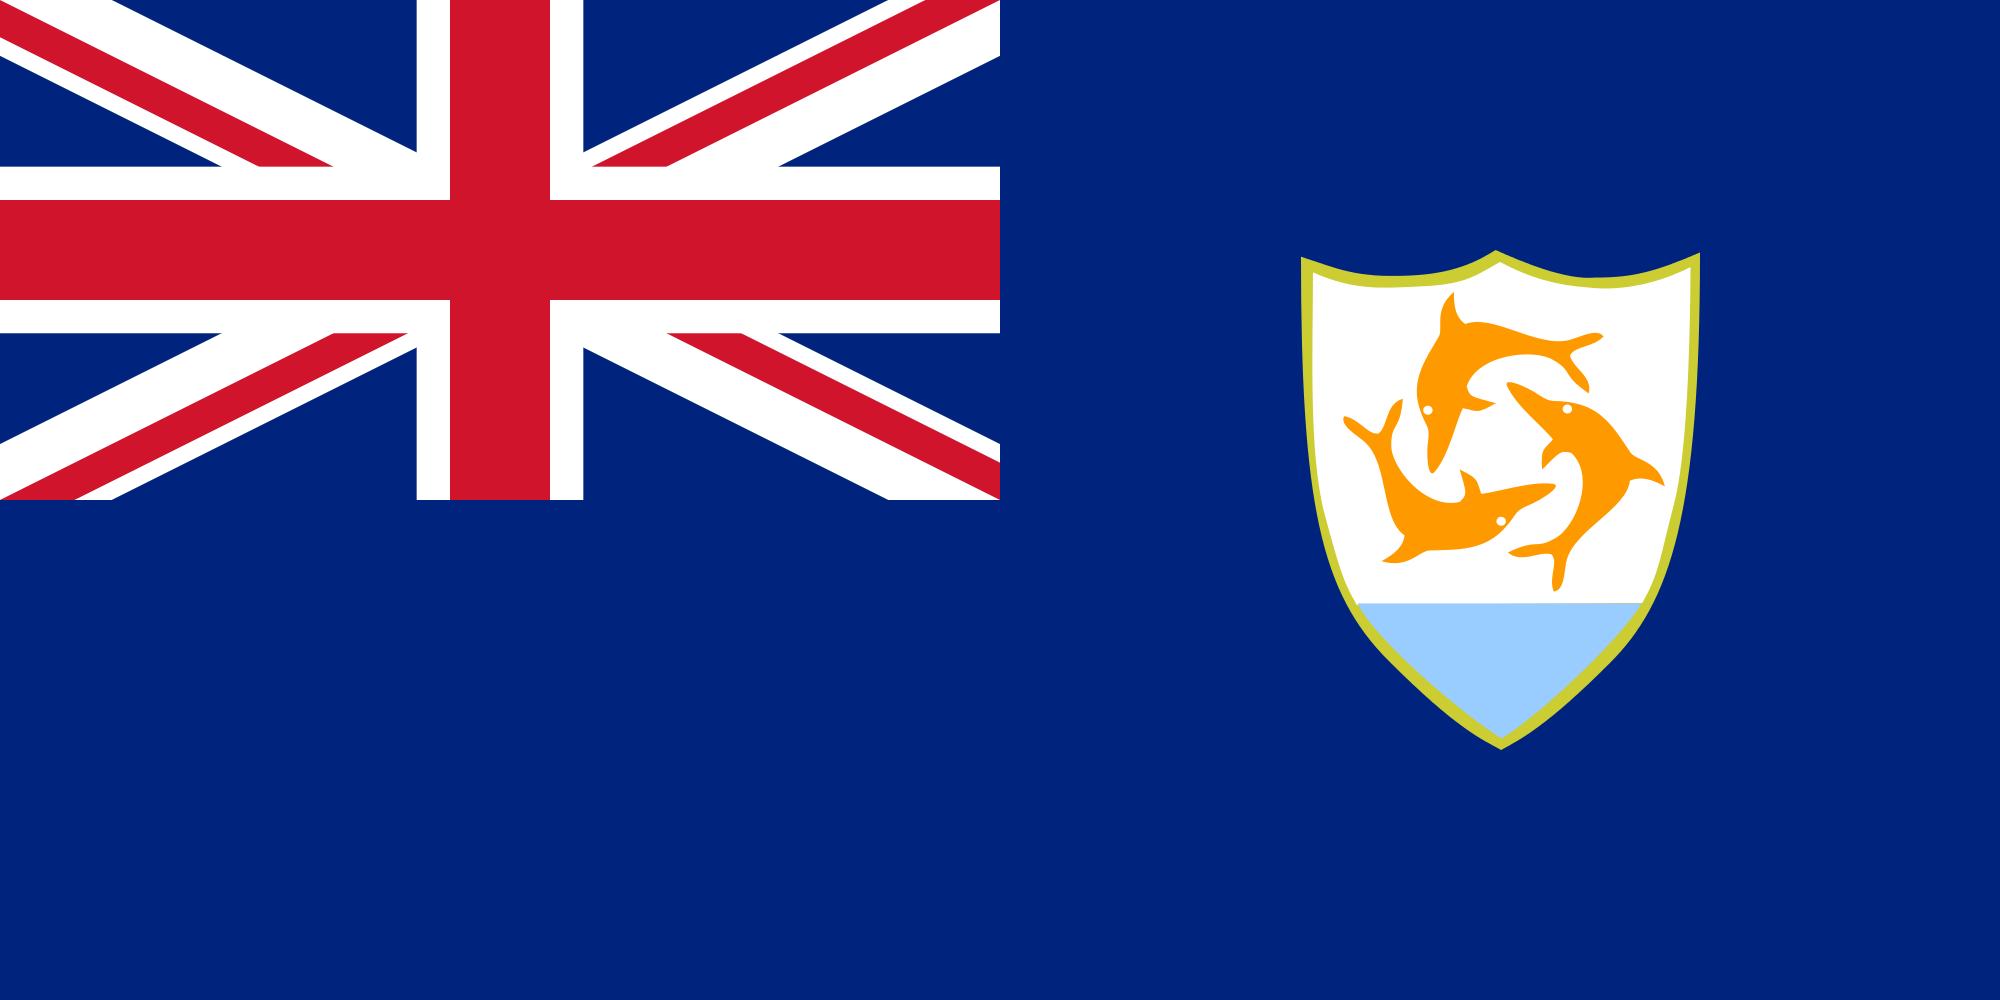 anguila, страна, Эмблема, логотип, символ - Обои HD - Профессор falken.com